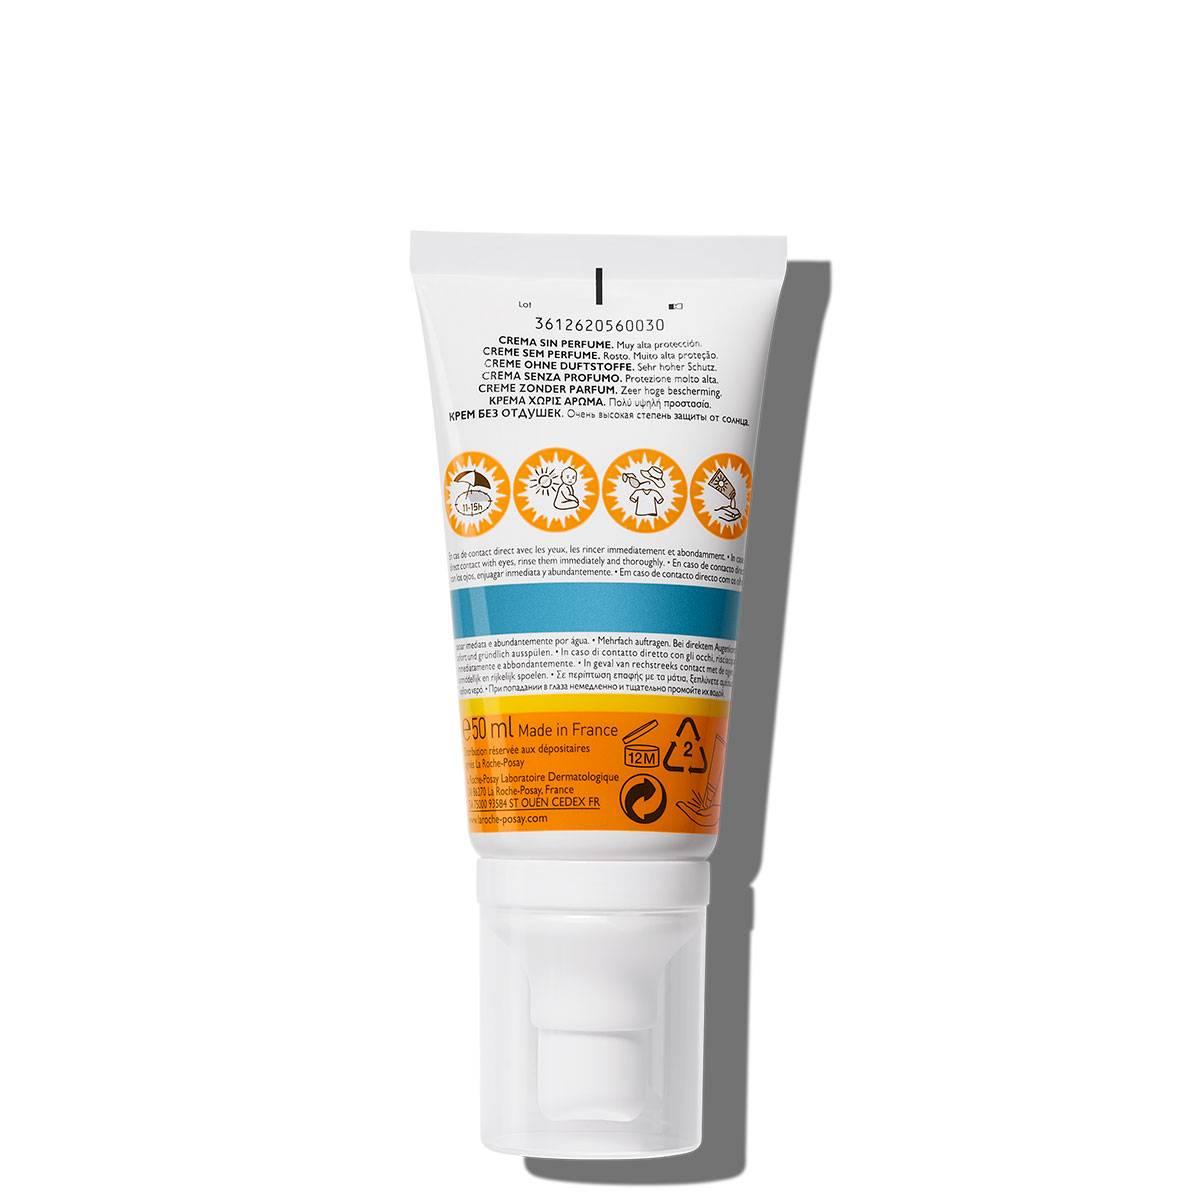 La Roche Posay ProduktSide Sol Anthelios Ultra Face Spf50 50ml Fragran